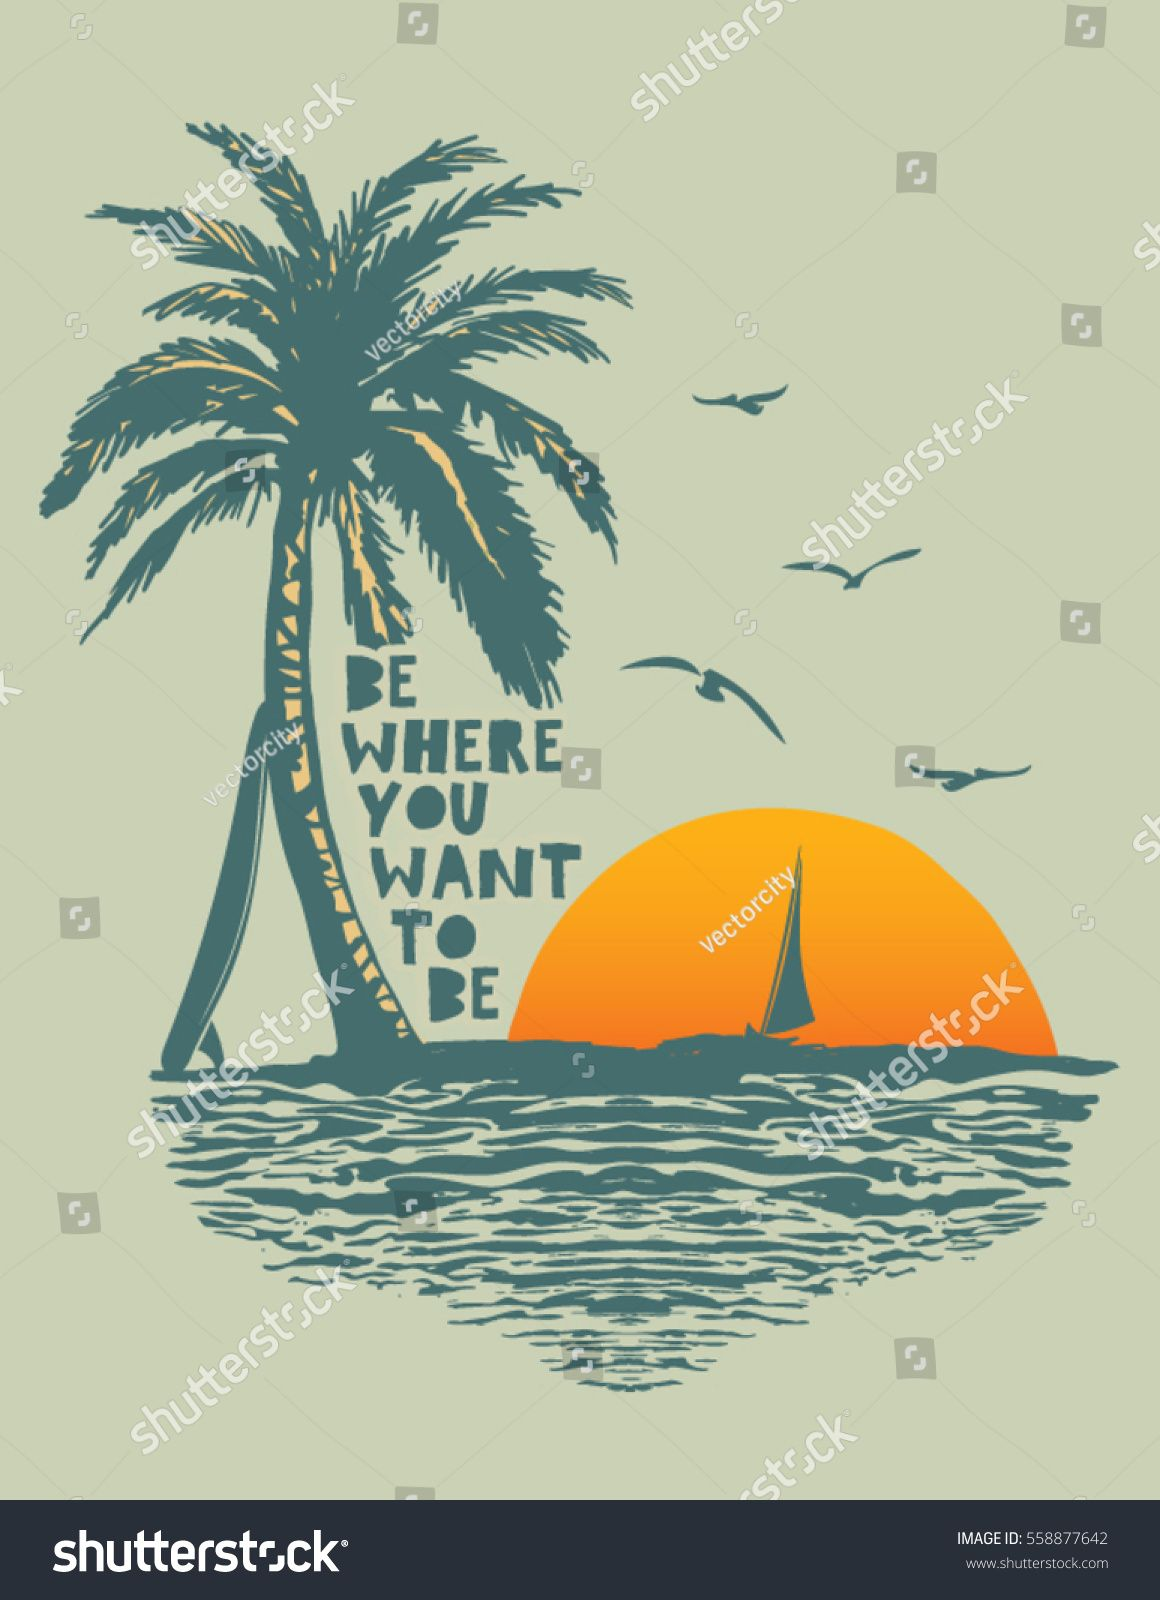 Sunset Surf And Beach Vintage Beach Print Tee Graphic Design Ad Paid Beach Vintage Sunset Surf In 2020 Vintage Surf Beach Graphics Beach Print